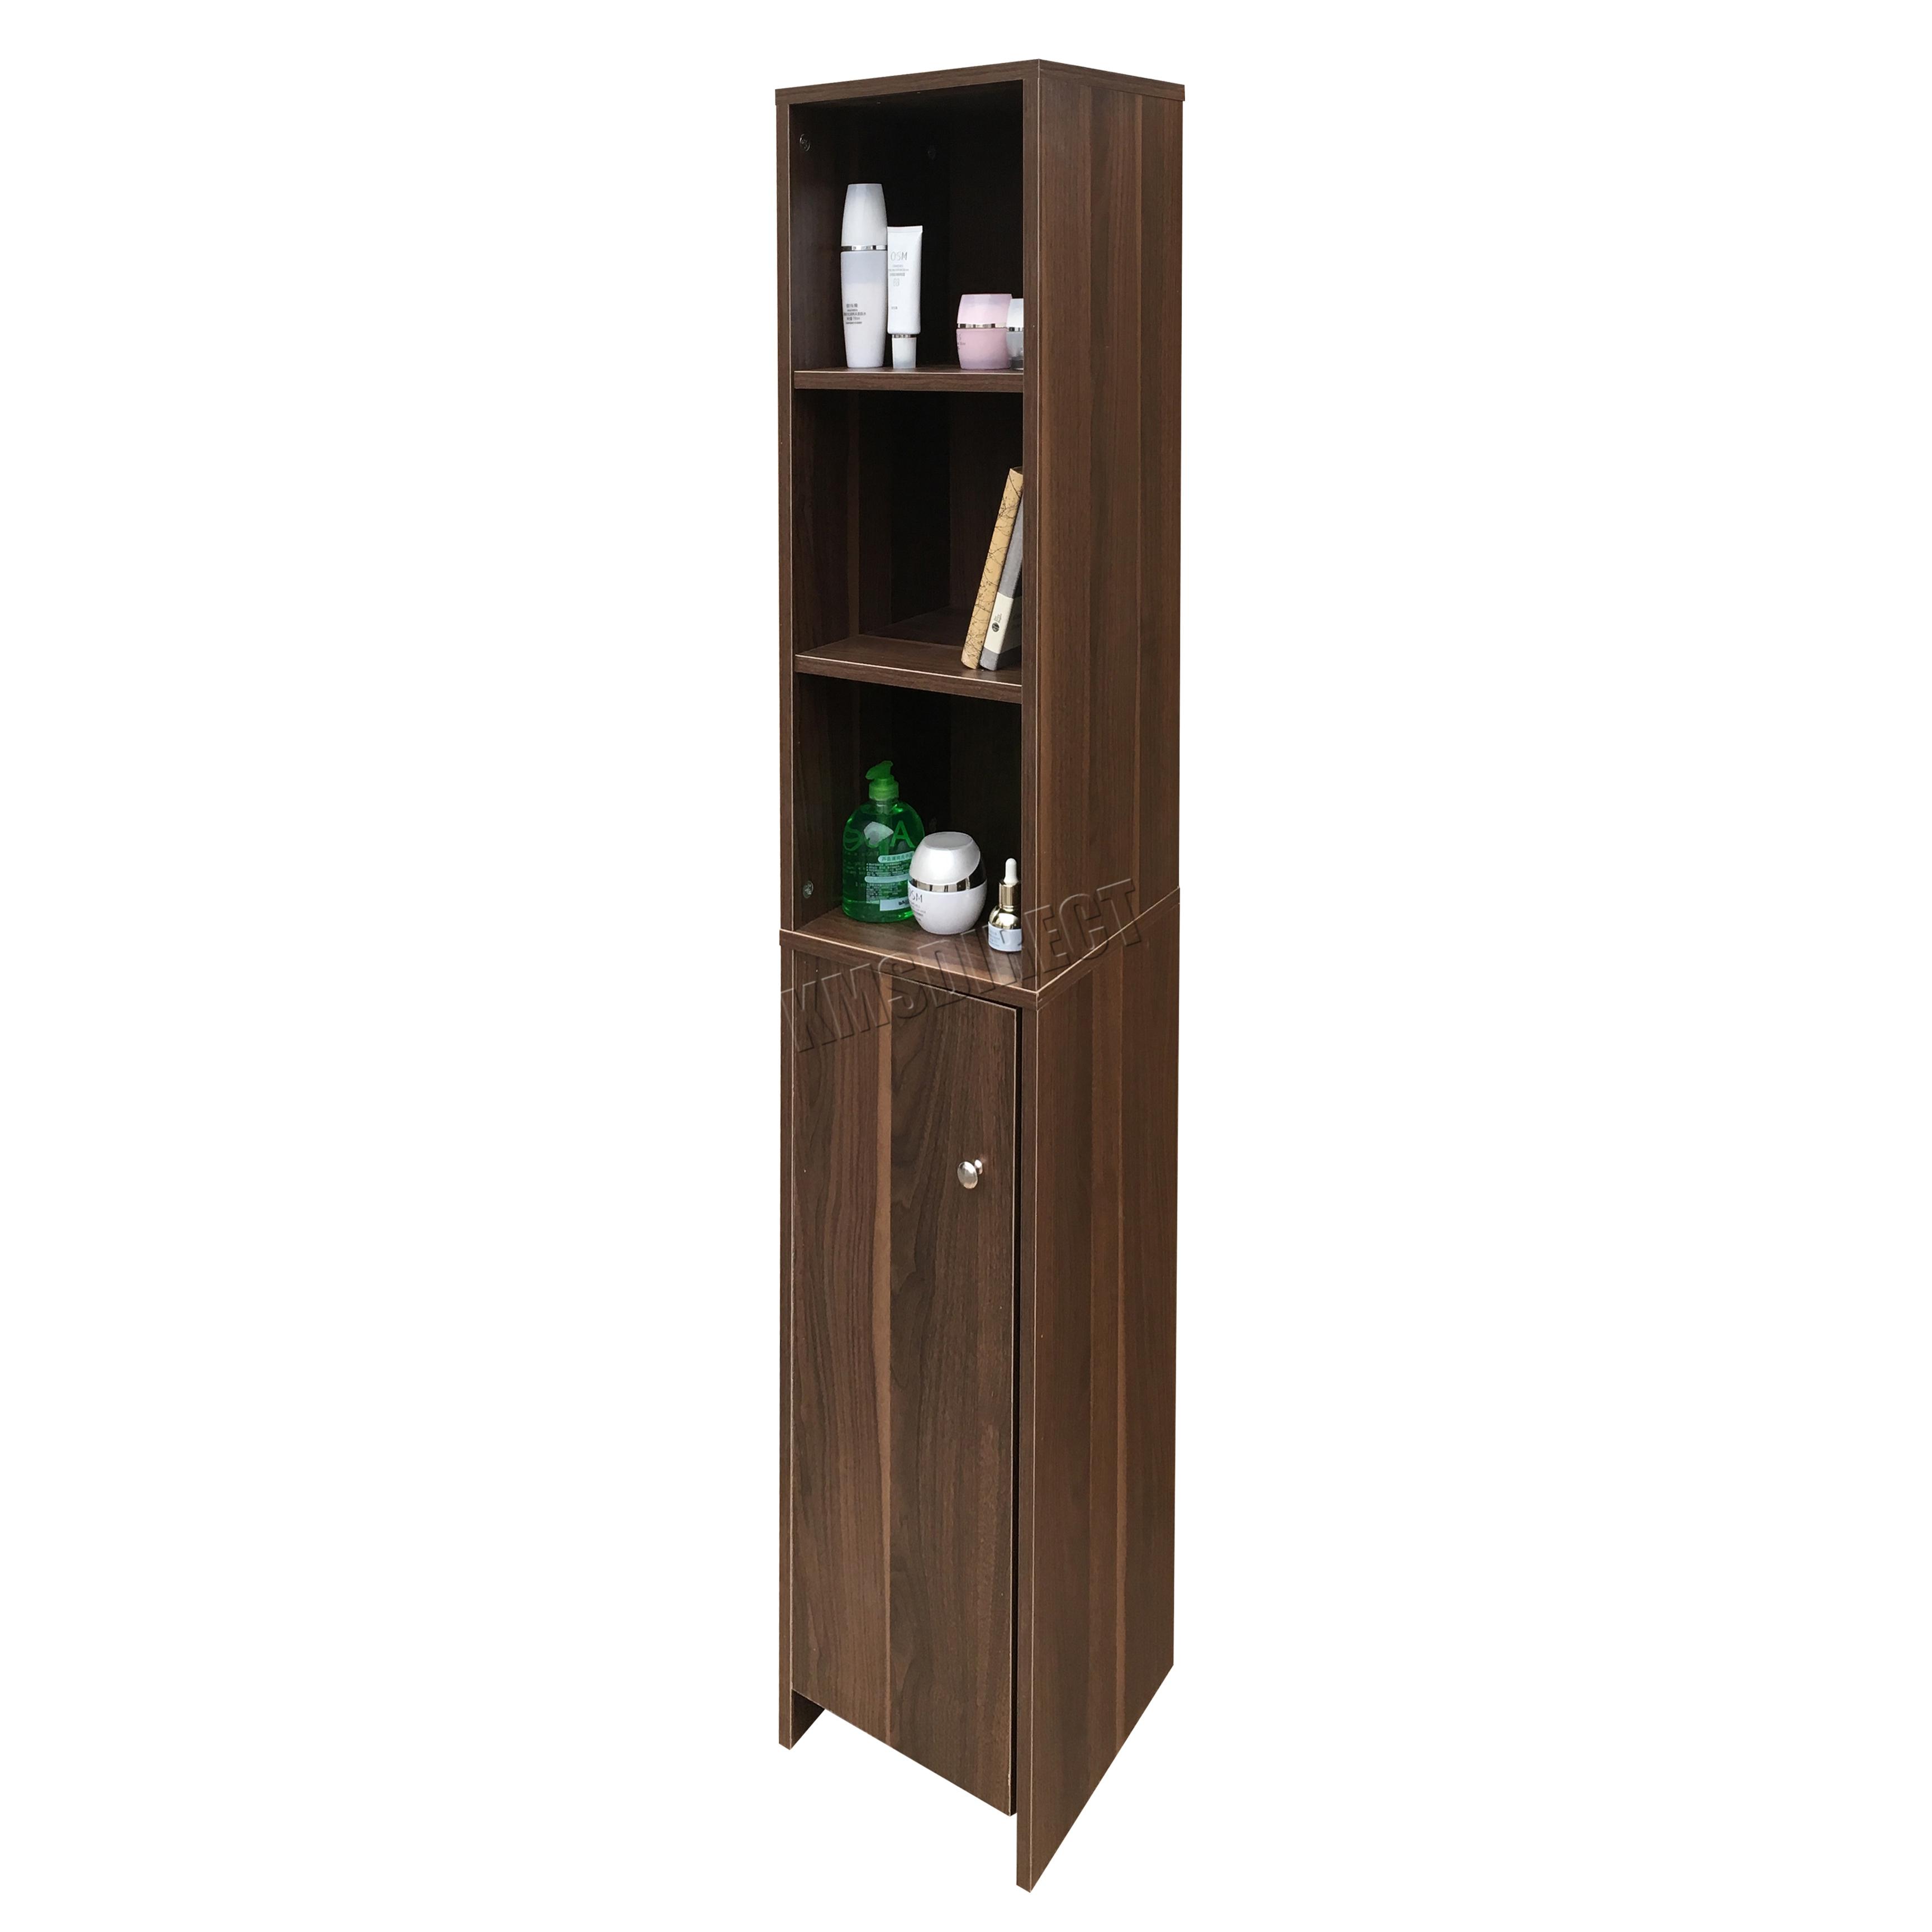 Foxhunter wall mount wooden bathroom cabinet tall shelving for Tall wooden bathroom cabinets